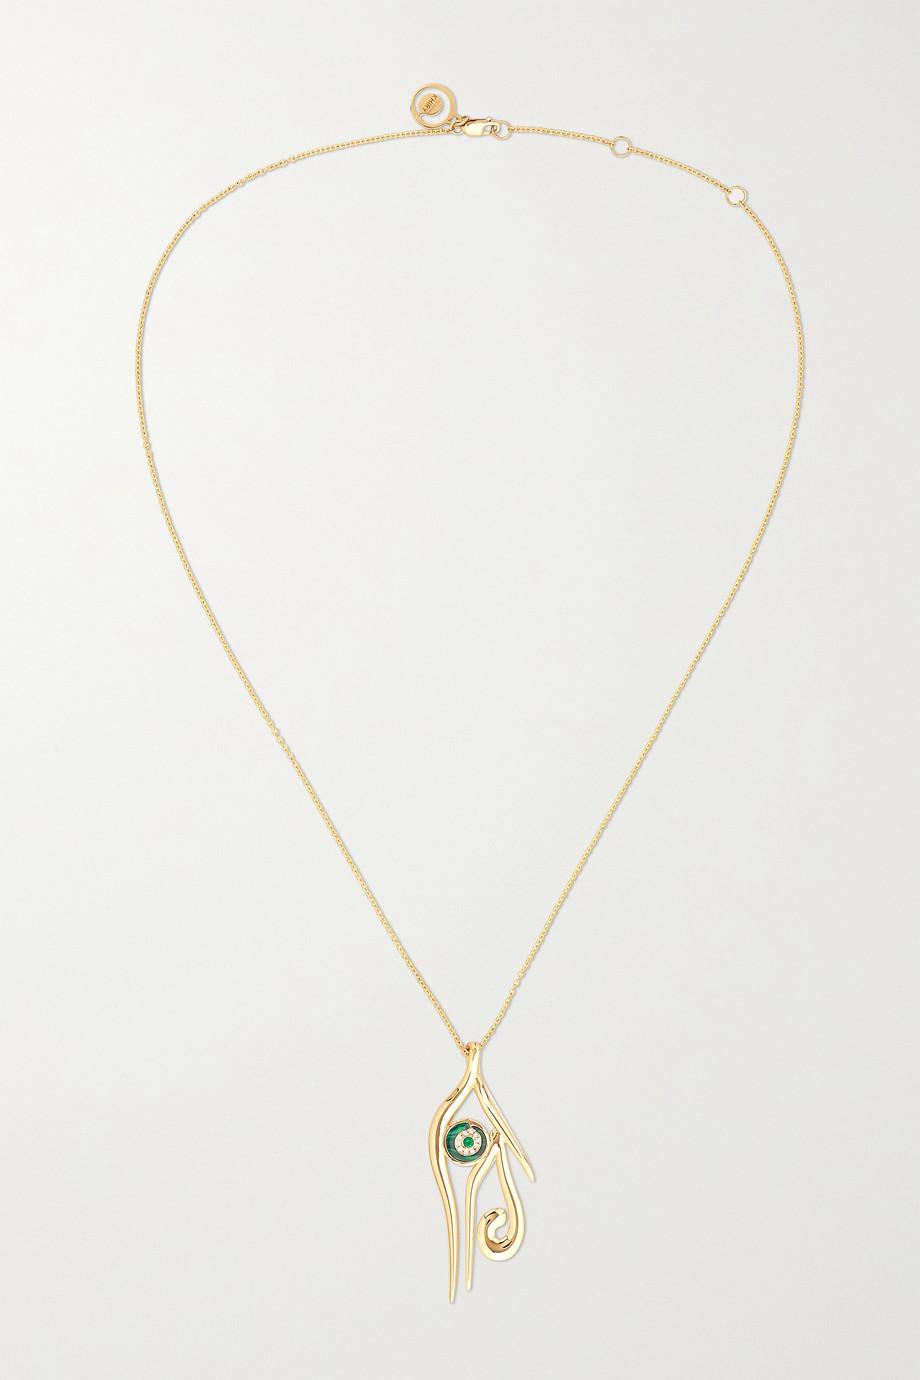 KHIRY Fine Collier en or 18 carats et pierres multiples Horus